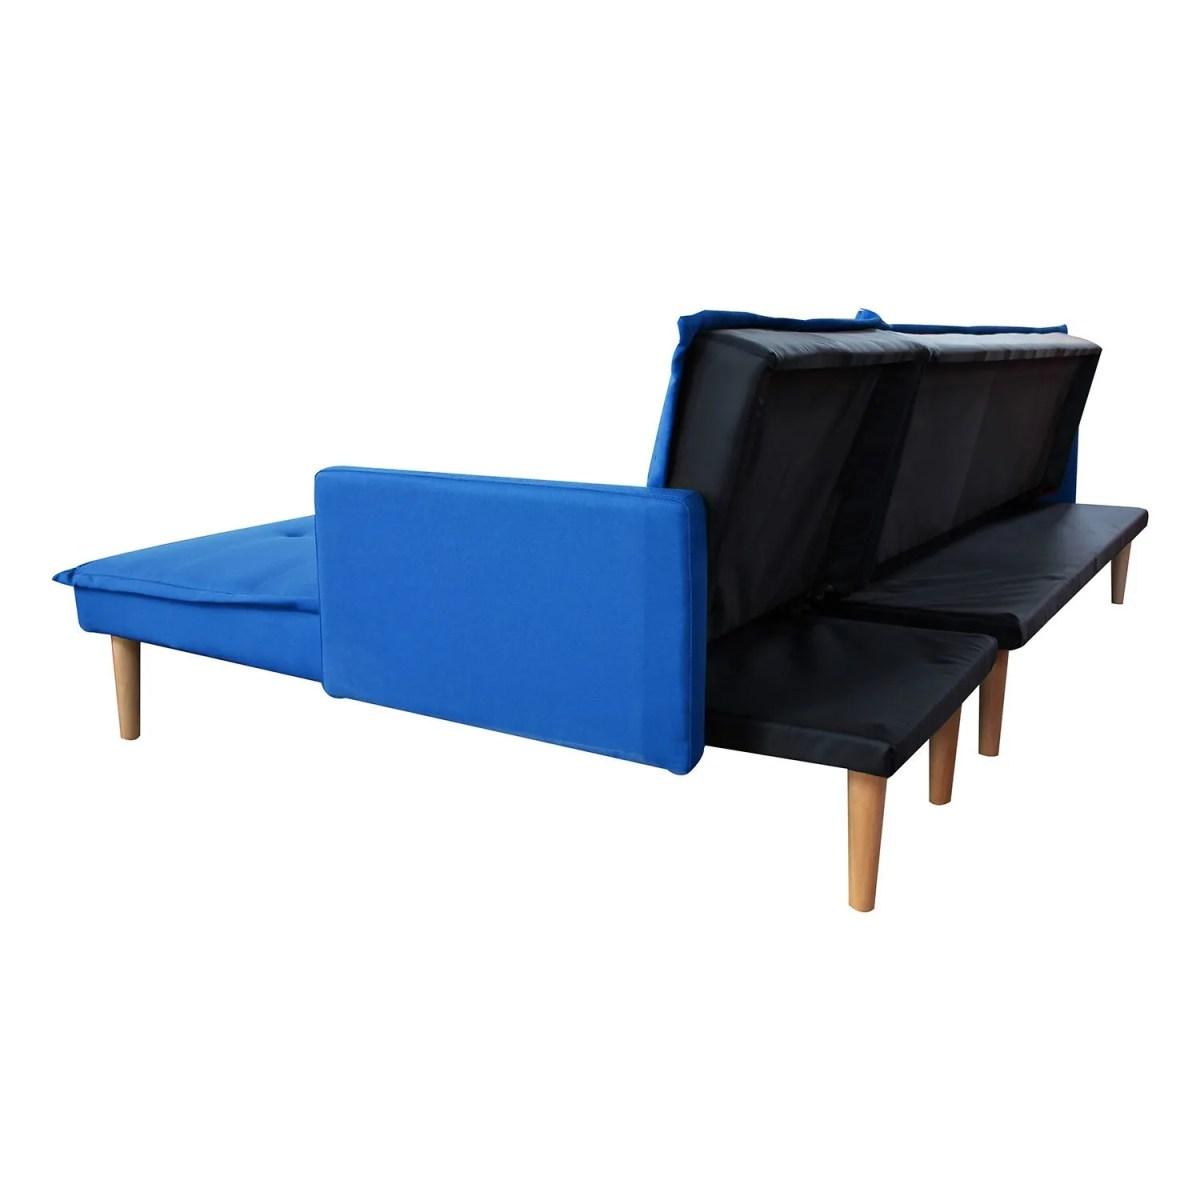 sala esquinada sofá cama independencia azul 8